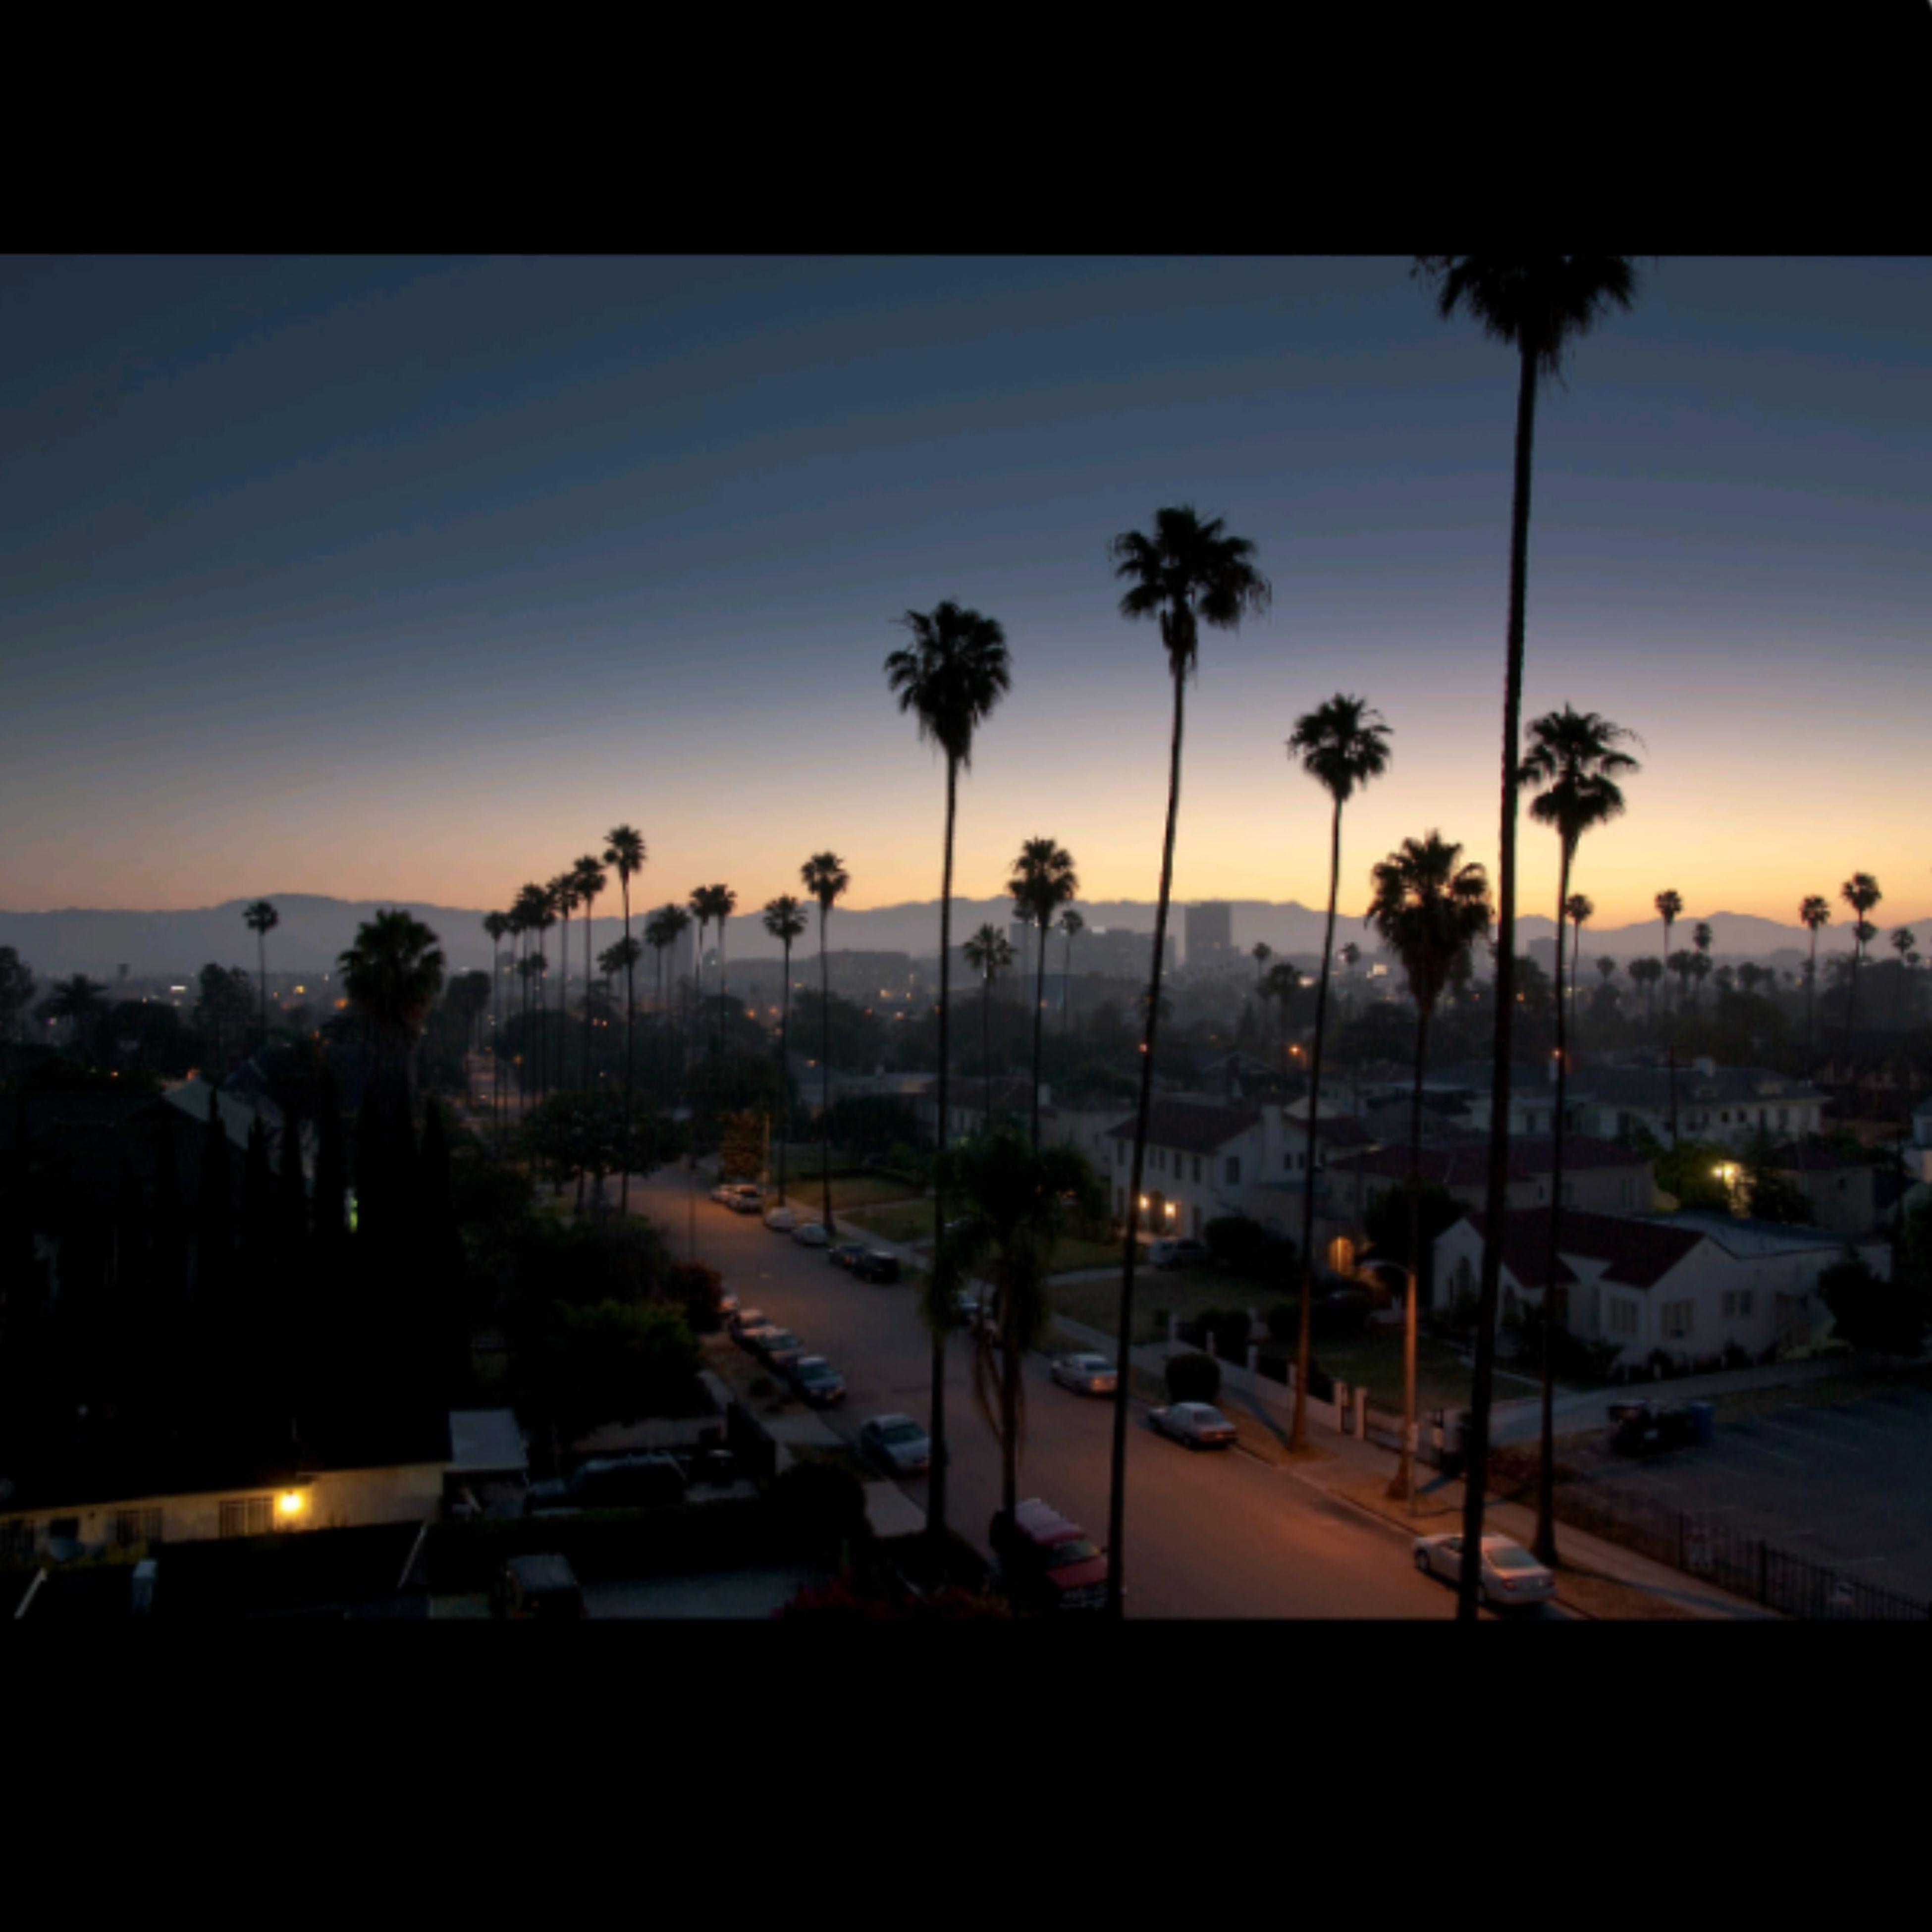 palm tree, sunset, tree, silhouette, transportation, car, sky, mode of transport, road, land vehicle, street light, street, dusk, sea, nature, travel, illuminated, tree trunk, outdoors, growth